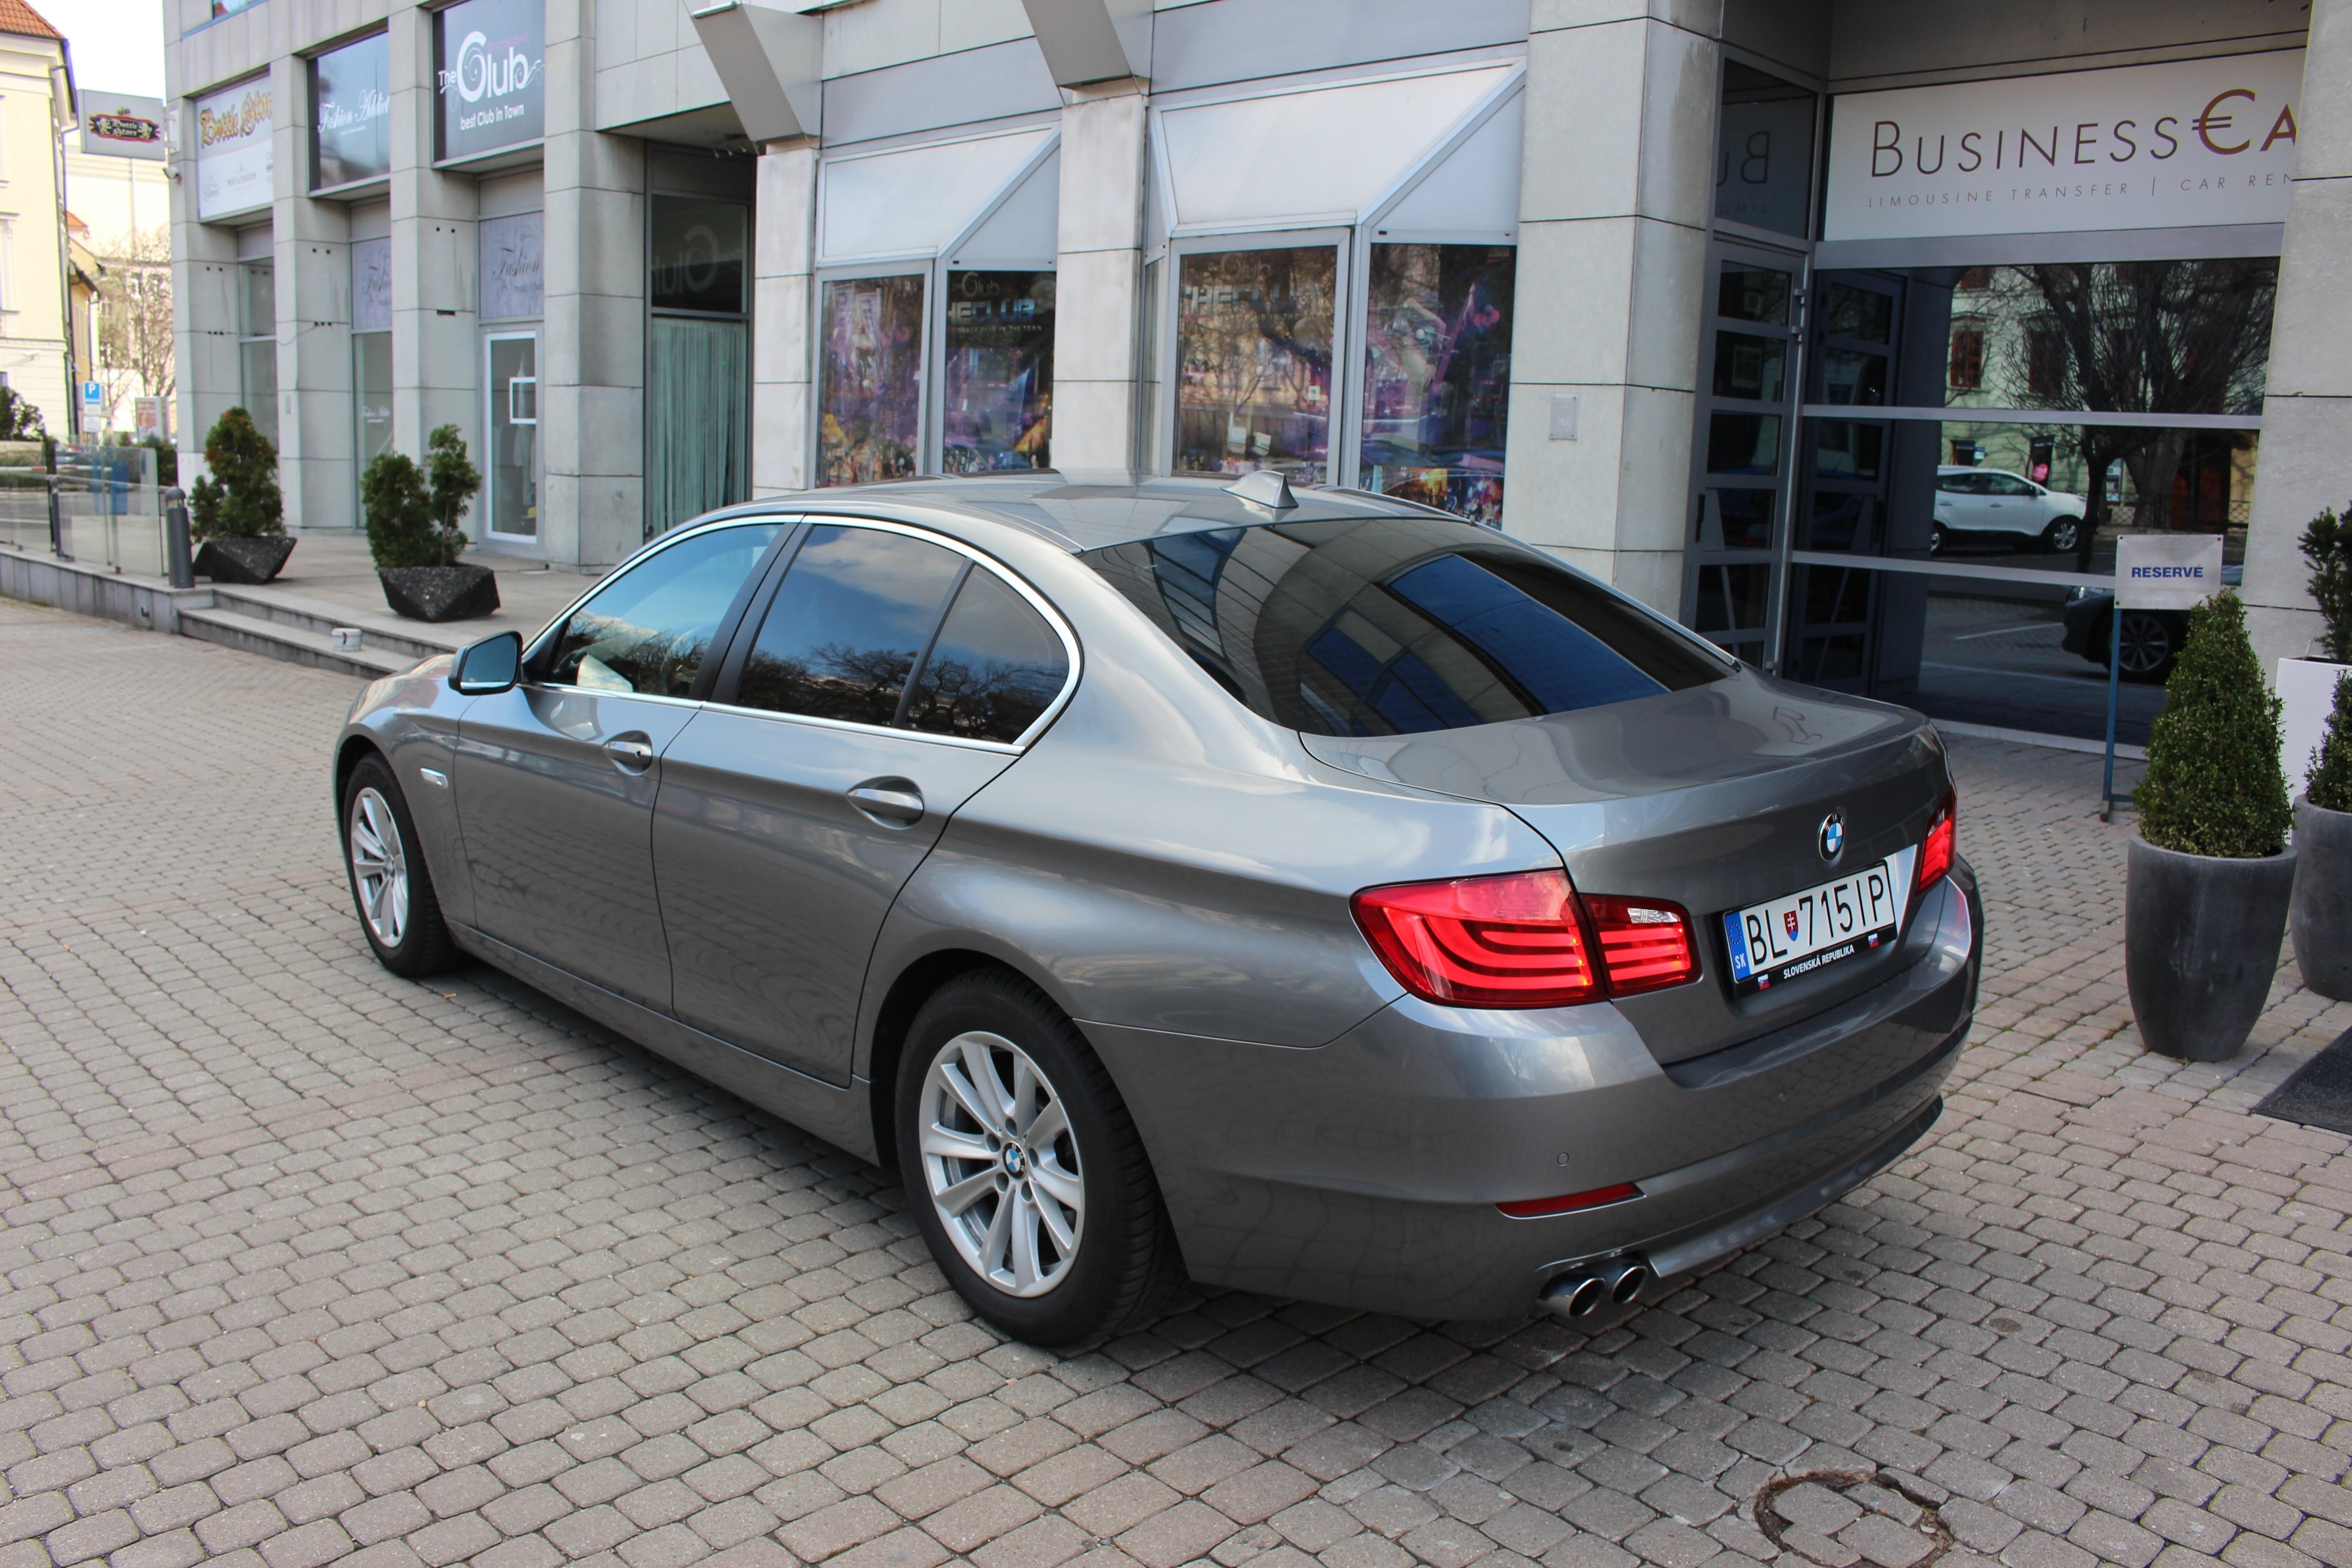 webcamsex luxury escort bratislava